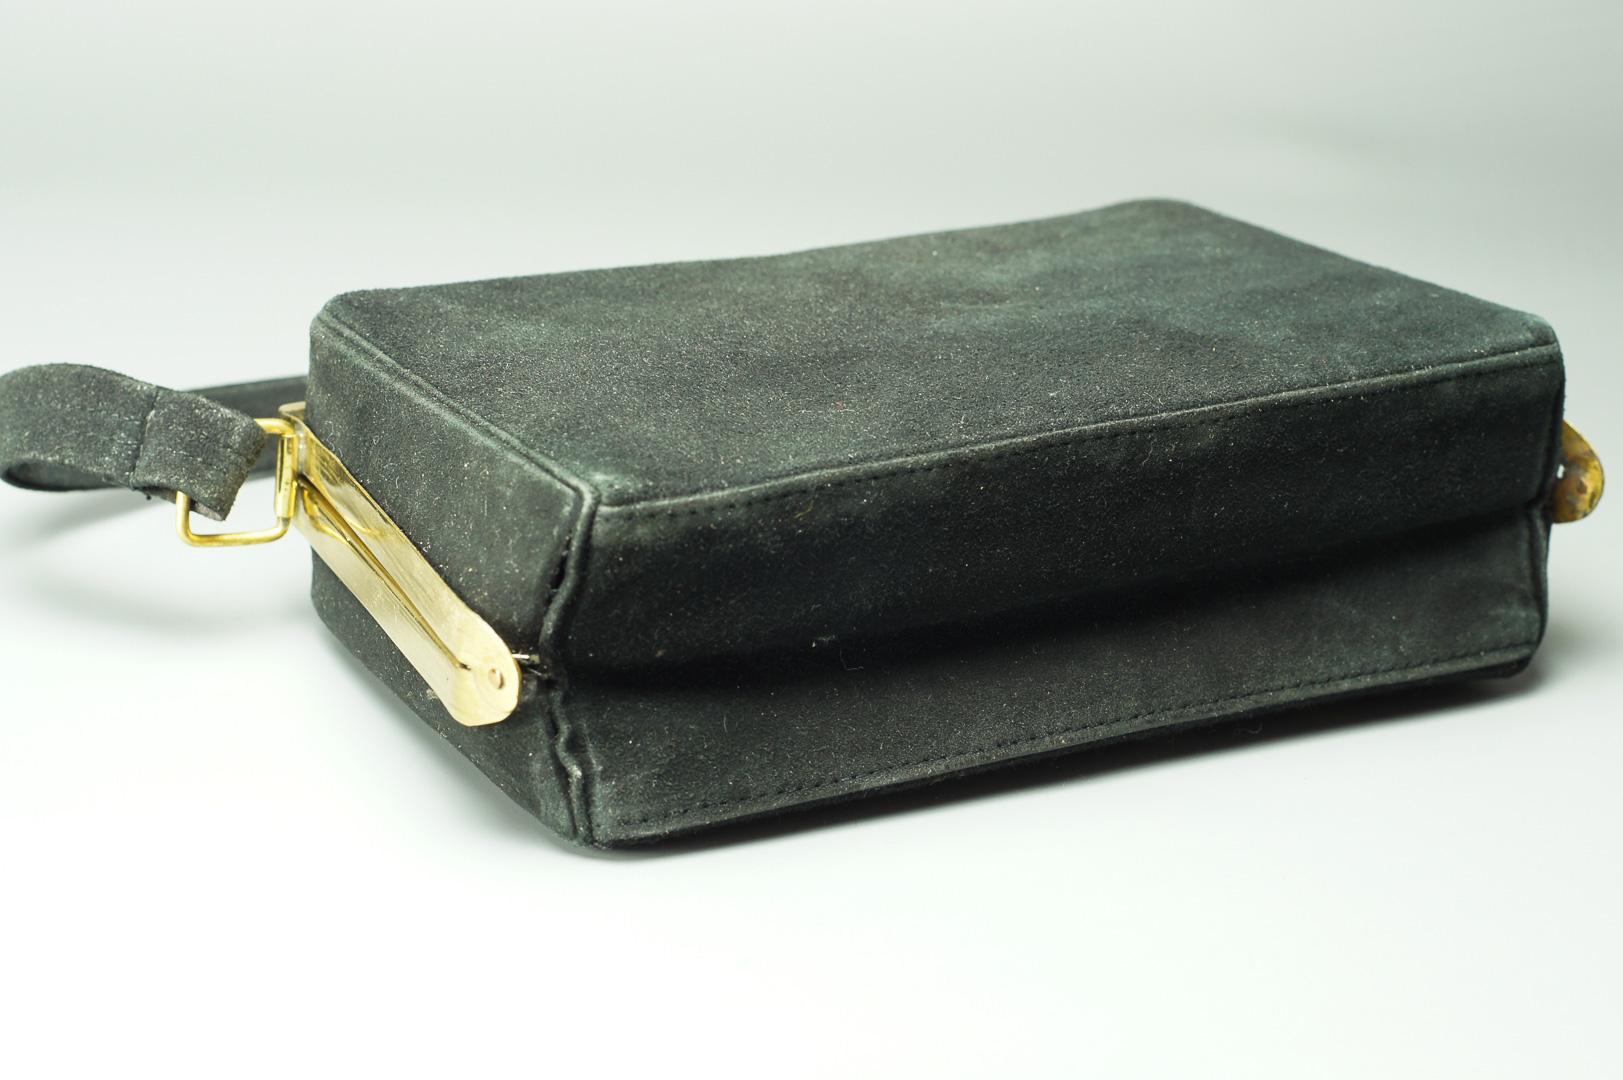 Сумочка винтажная с вышивкой 1950-е